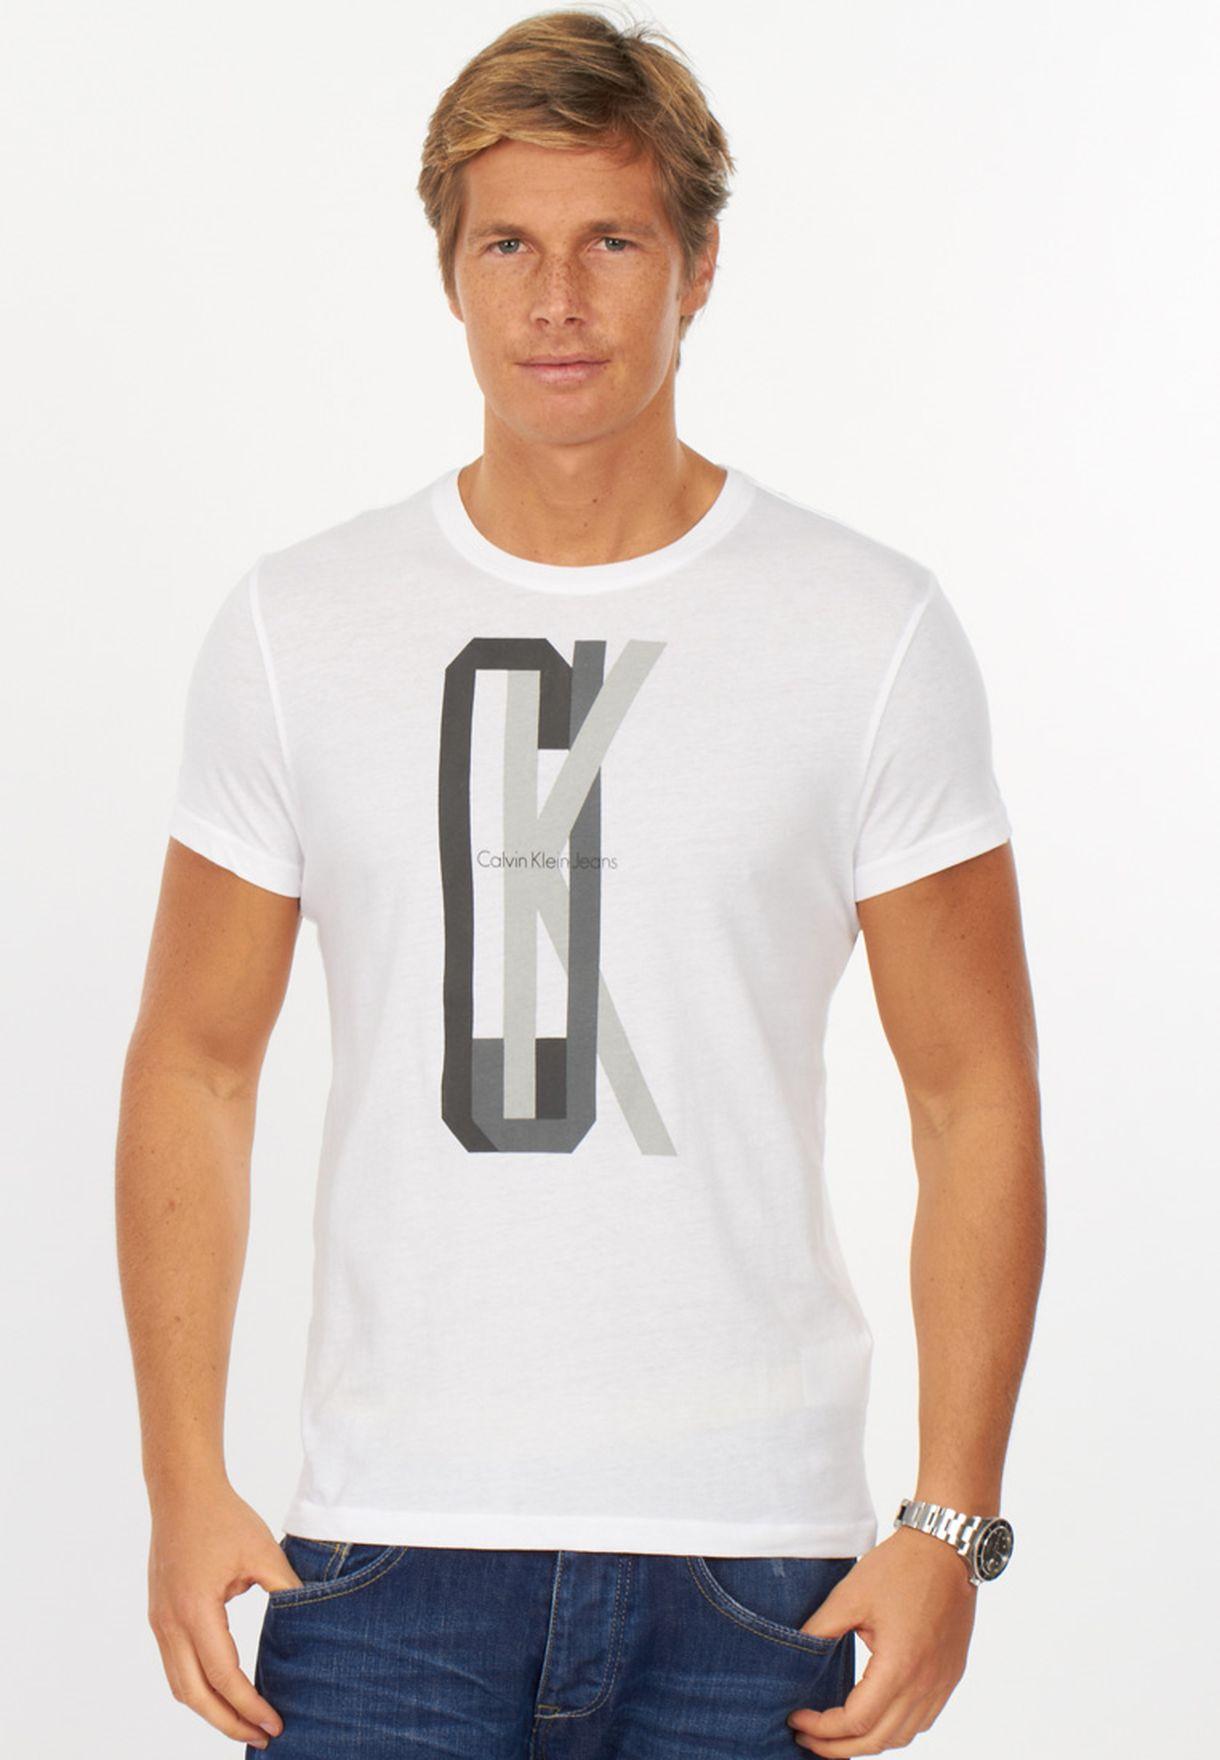 f8d21b3e Shop Calvin Klein Jeans white Crew Neck Tshirt for Men in Kuwait ...